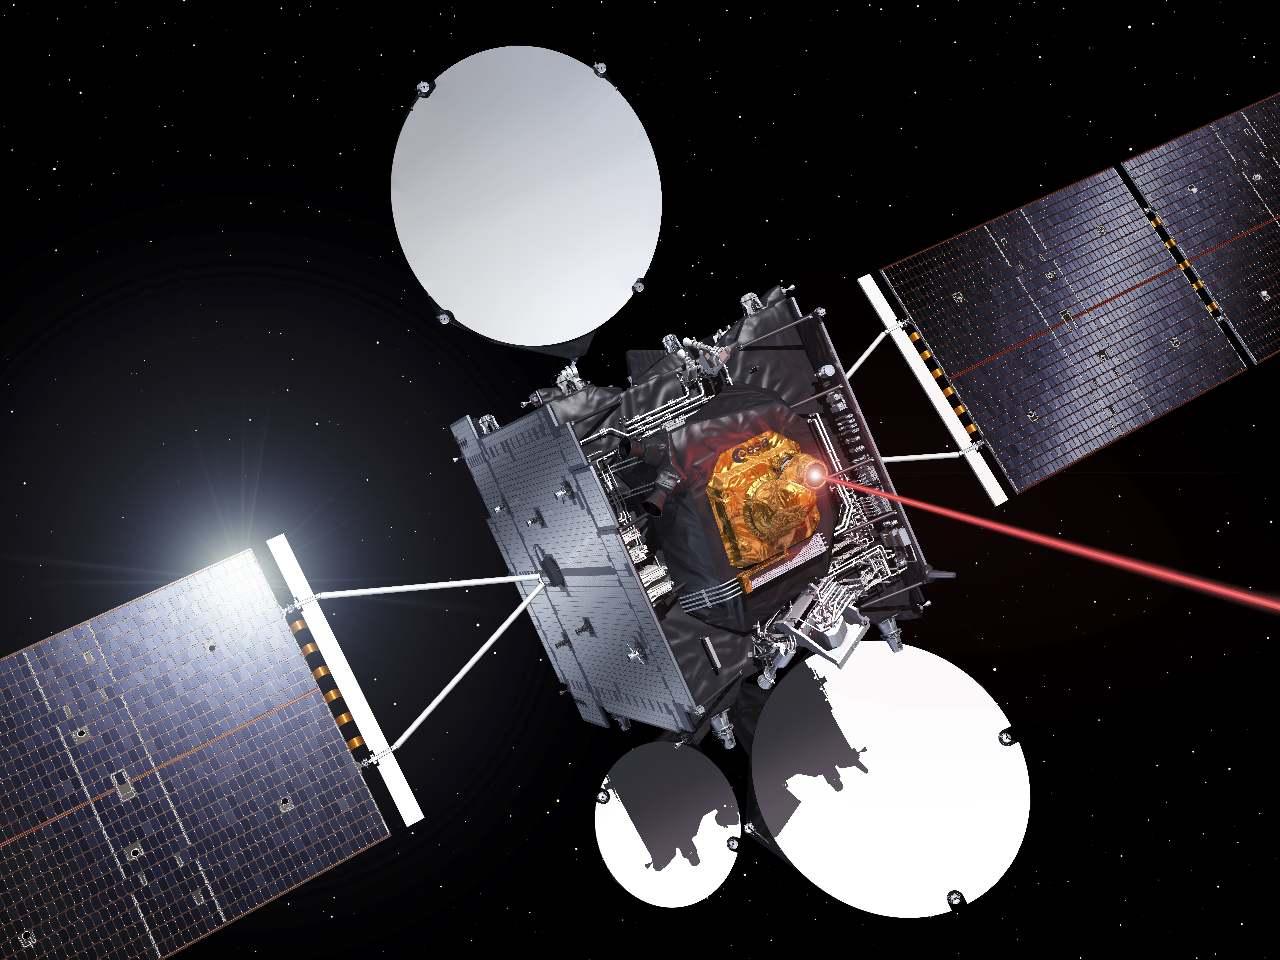 Airbus DS starts work on Asia-Pacific node of SpaceDataHighway